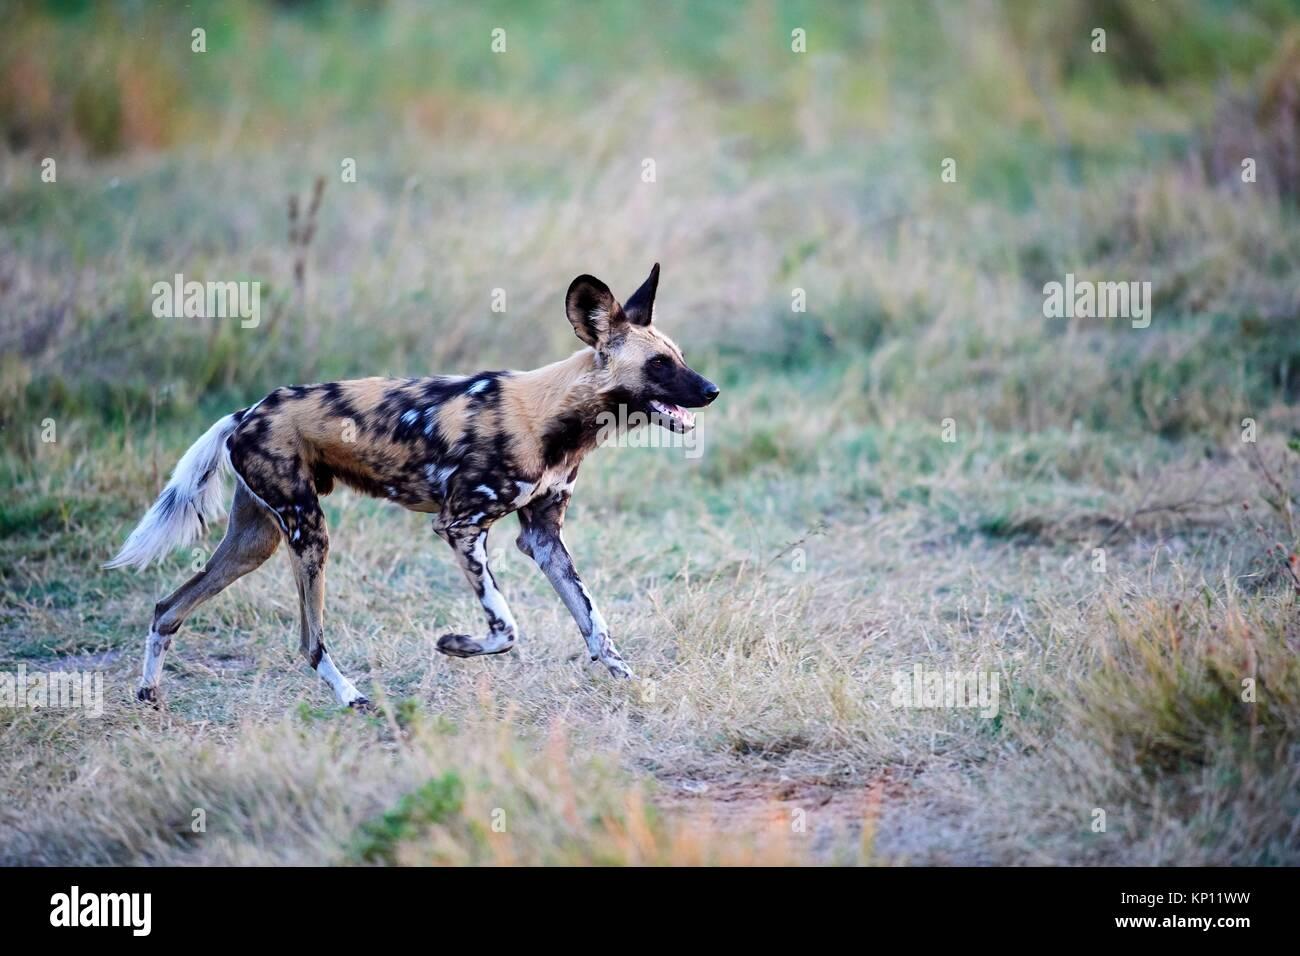 Afrikanischer Wildhund (Lycaon pictus) jagen. Moremi National Park, Okavango Delta, Botswana, Südafrika. Stockbild